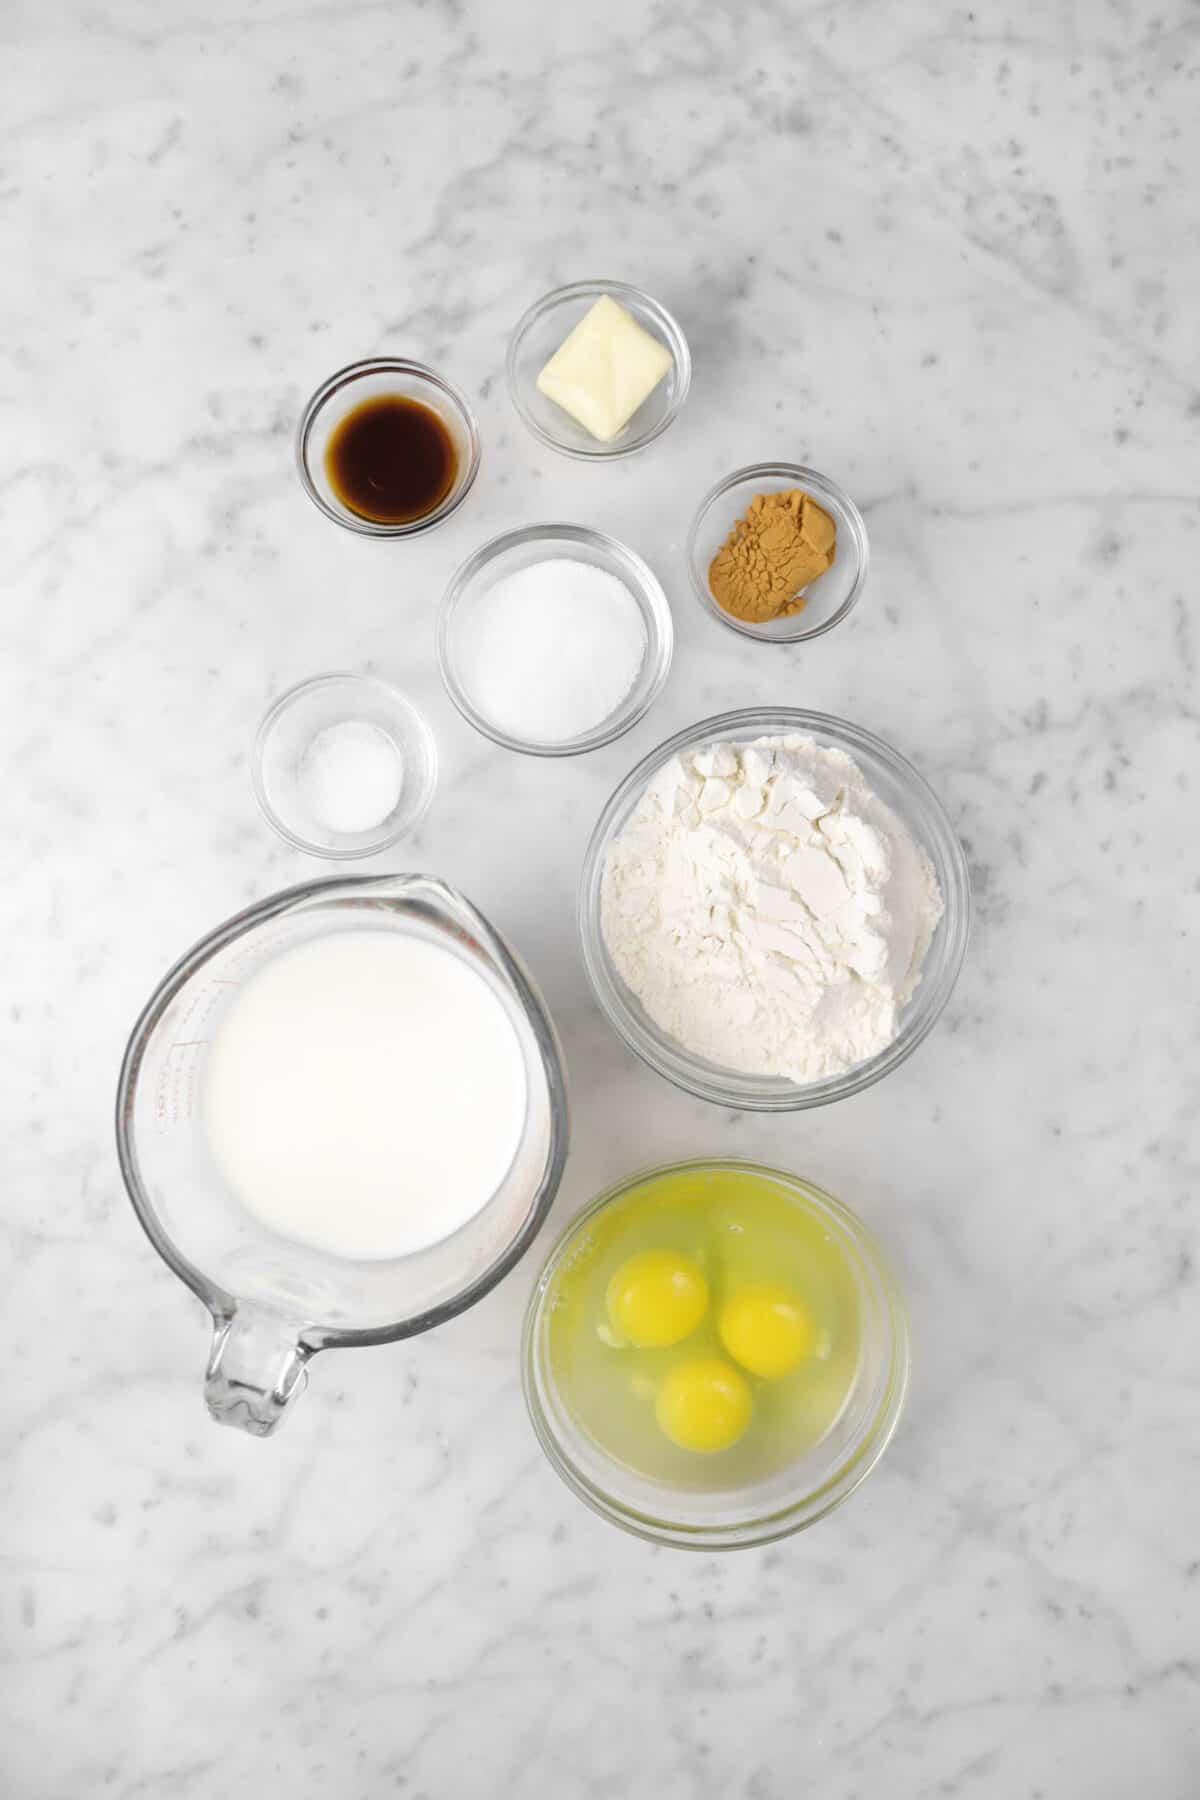 eggs, flour, milk, salt, sugar, cinnamon, vanilla, and butter in bowls